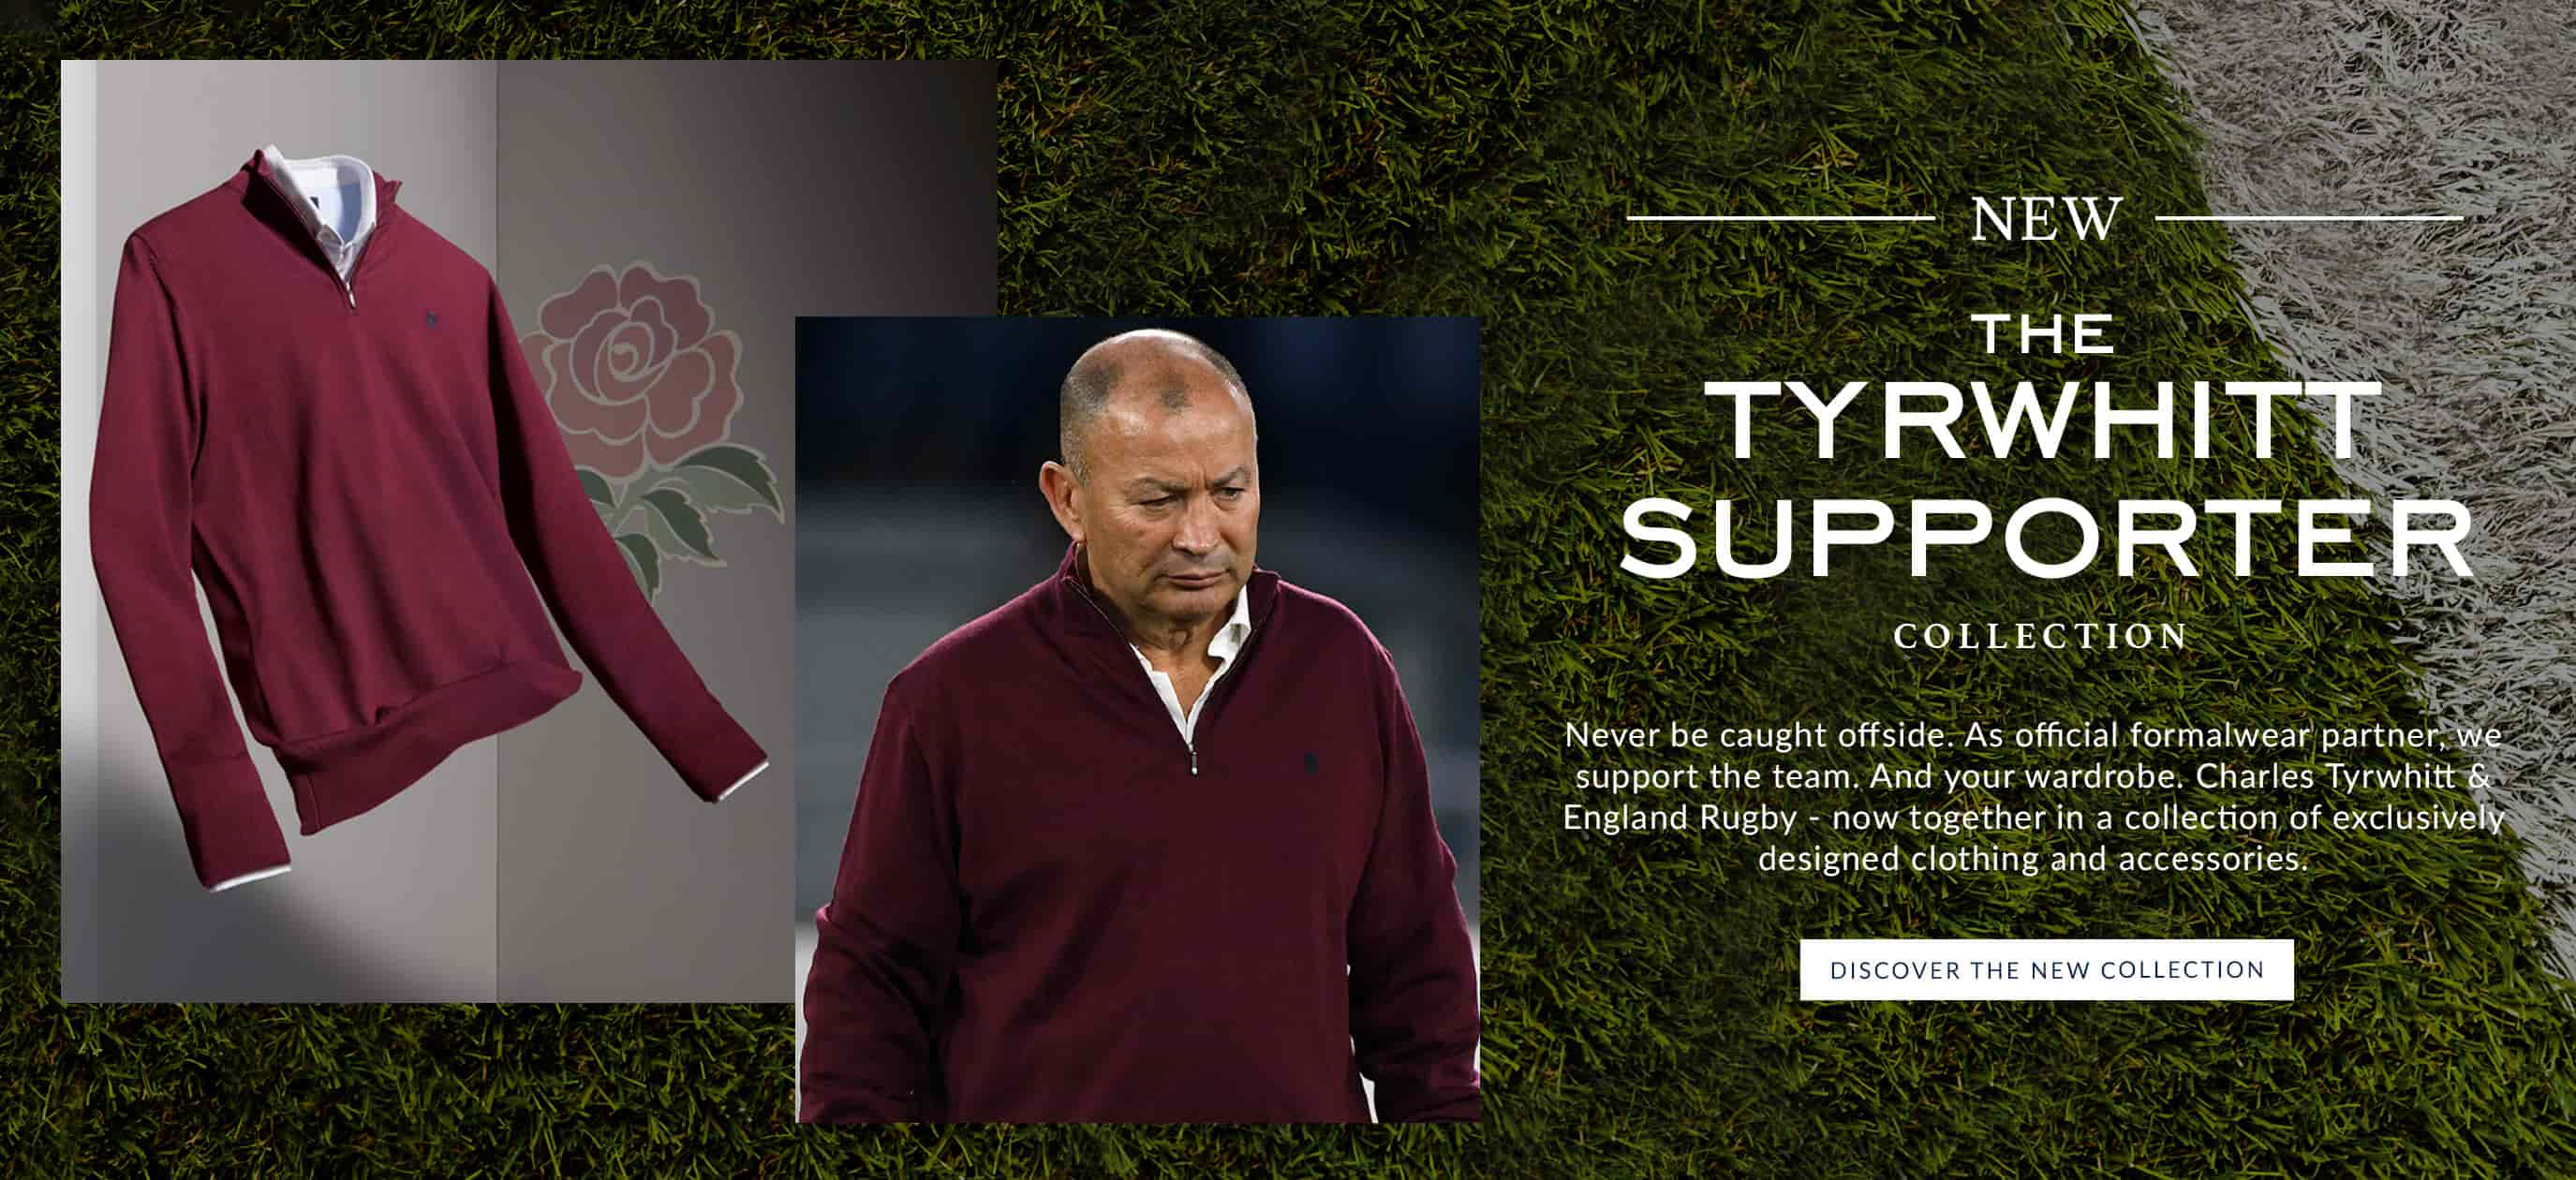 Eddie Jones, England Rugby Coach, wearing Charles Tyrwhitt burgundy merino knitwear